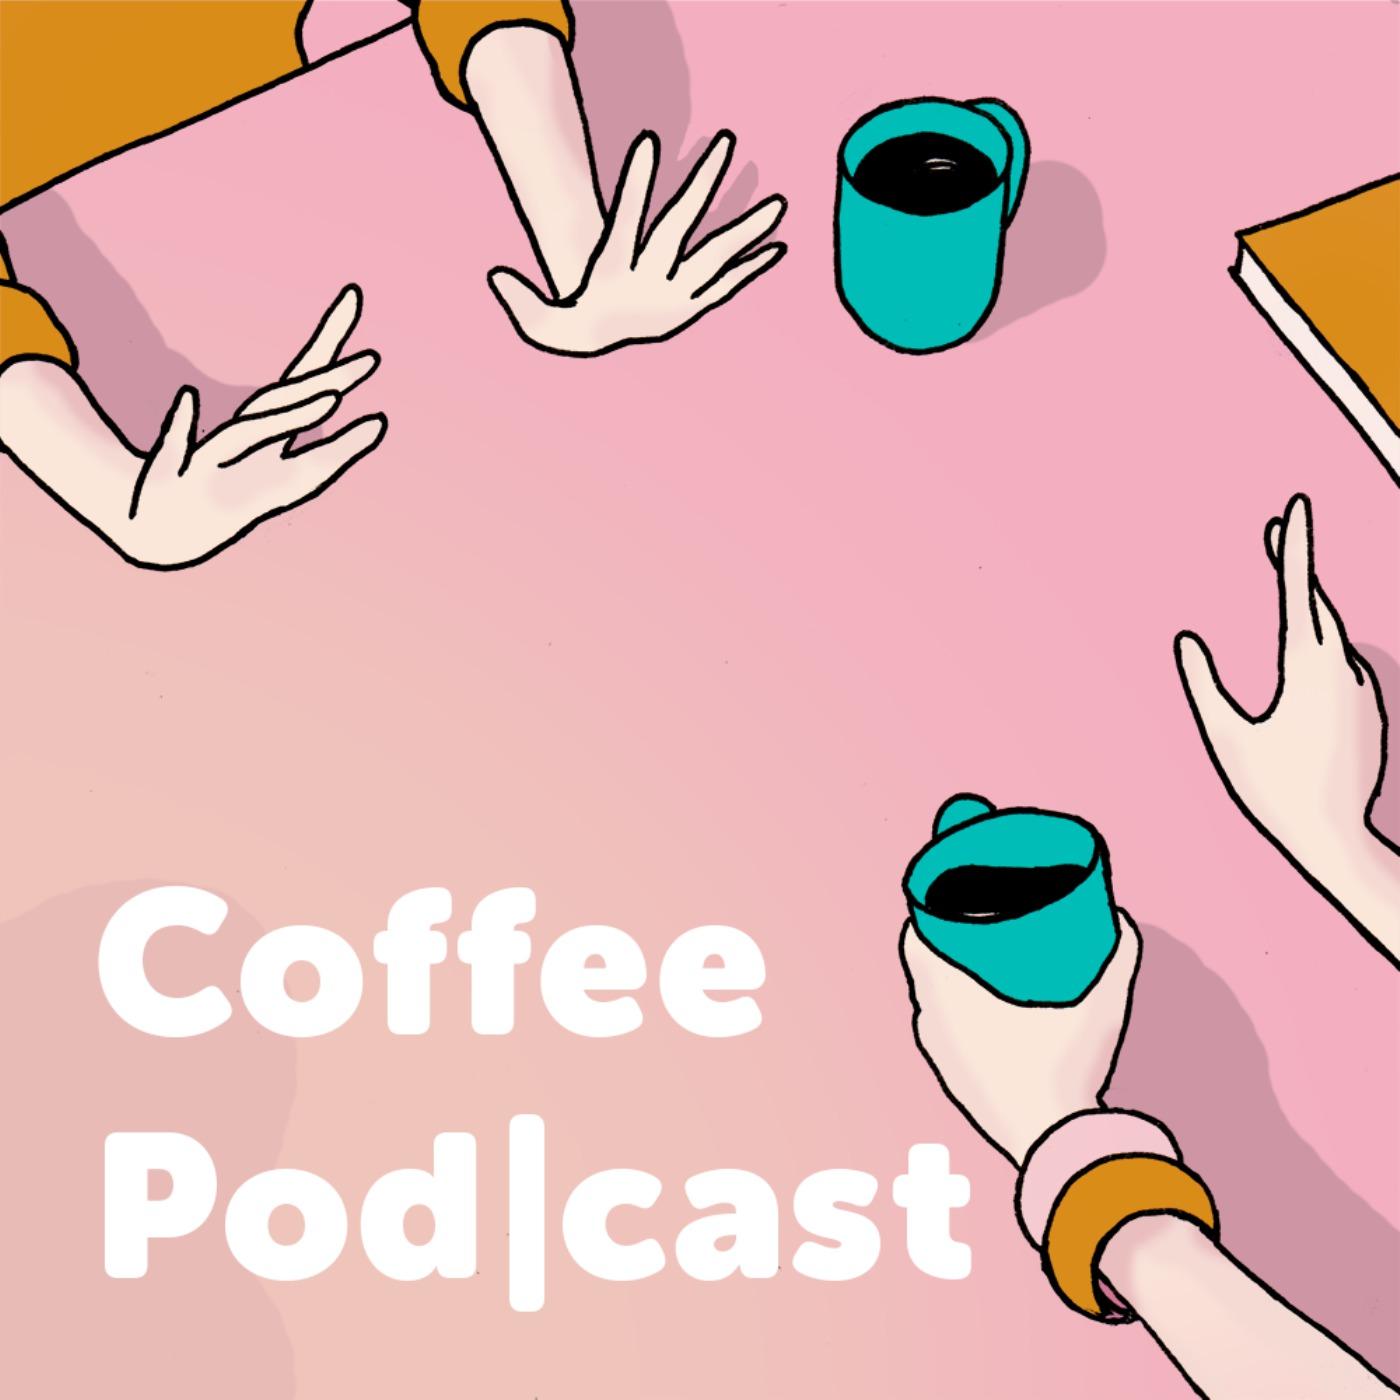 Coffee Pod cast